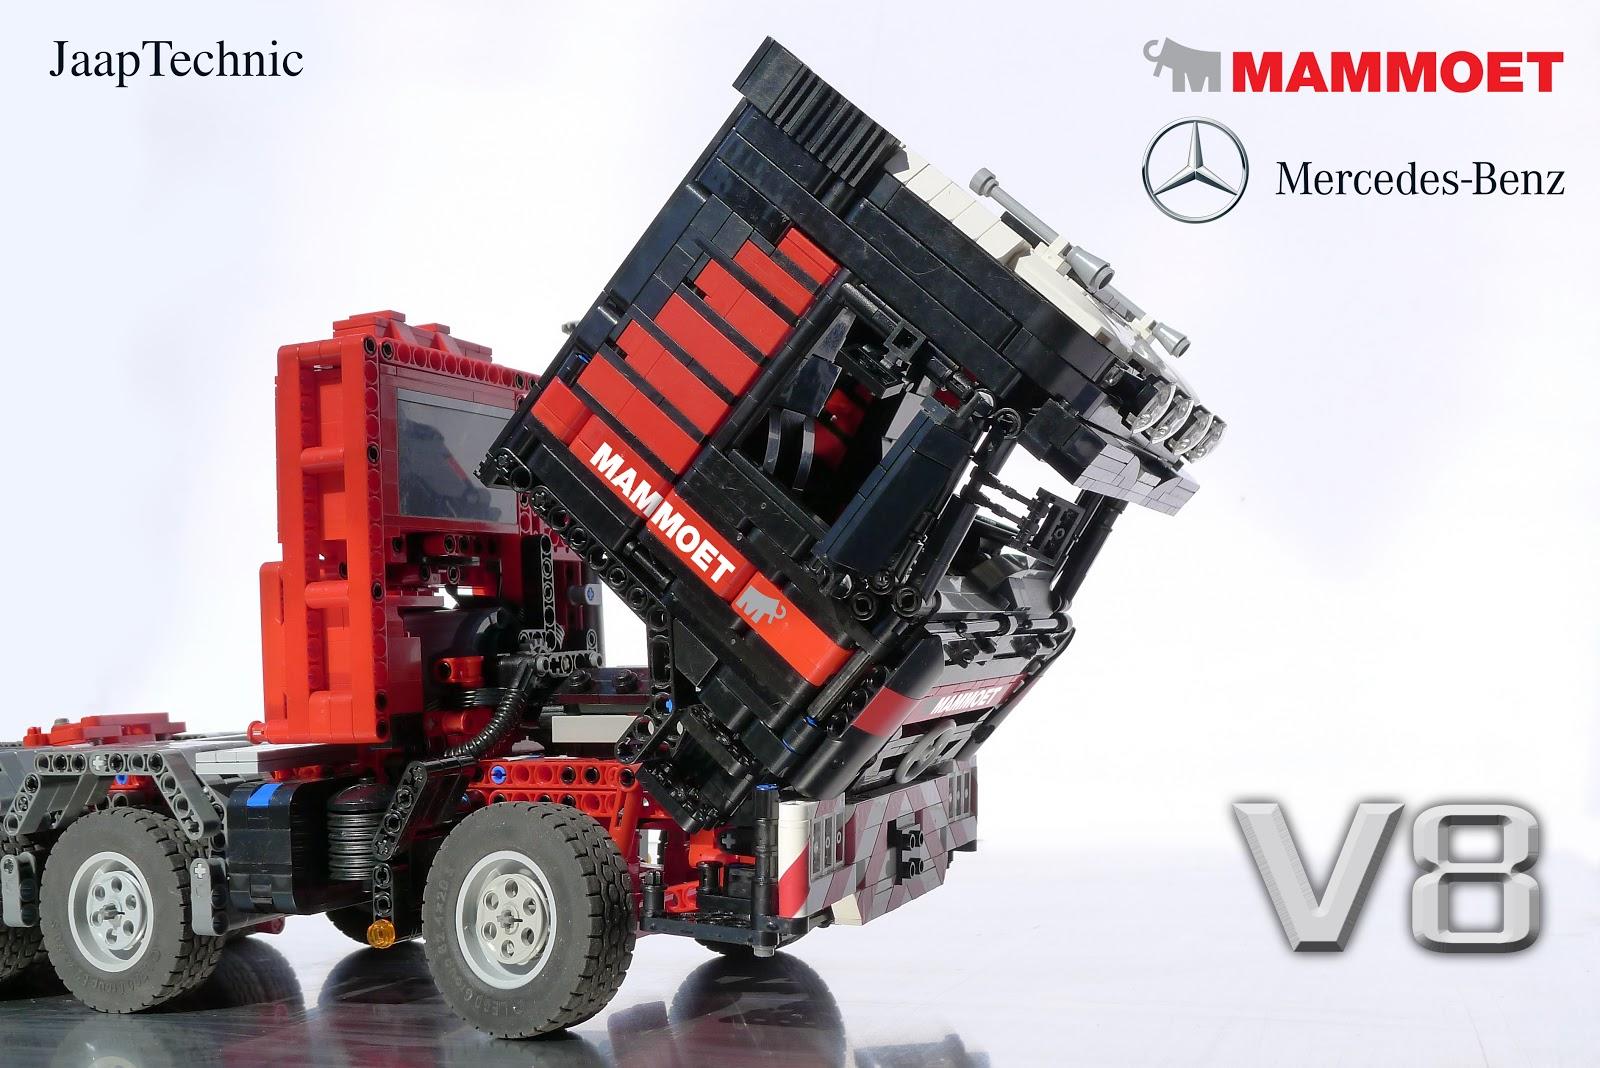 Truck Cab Inside >> Mercedes-Benz Actros 4160 Mammoet ~ JaapTechnic